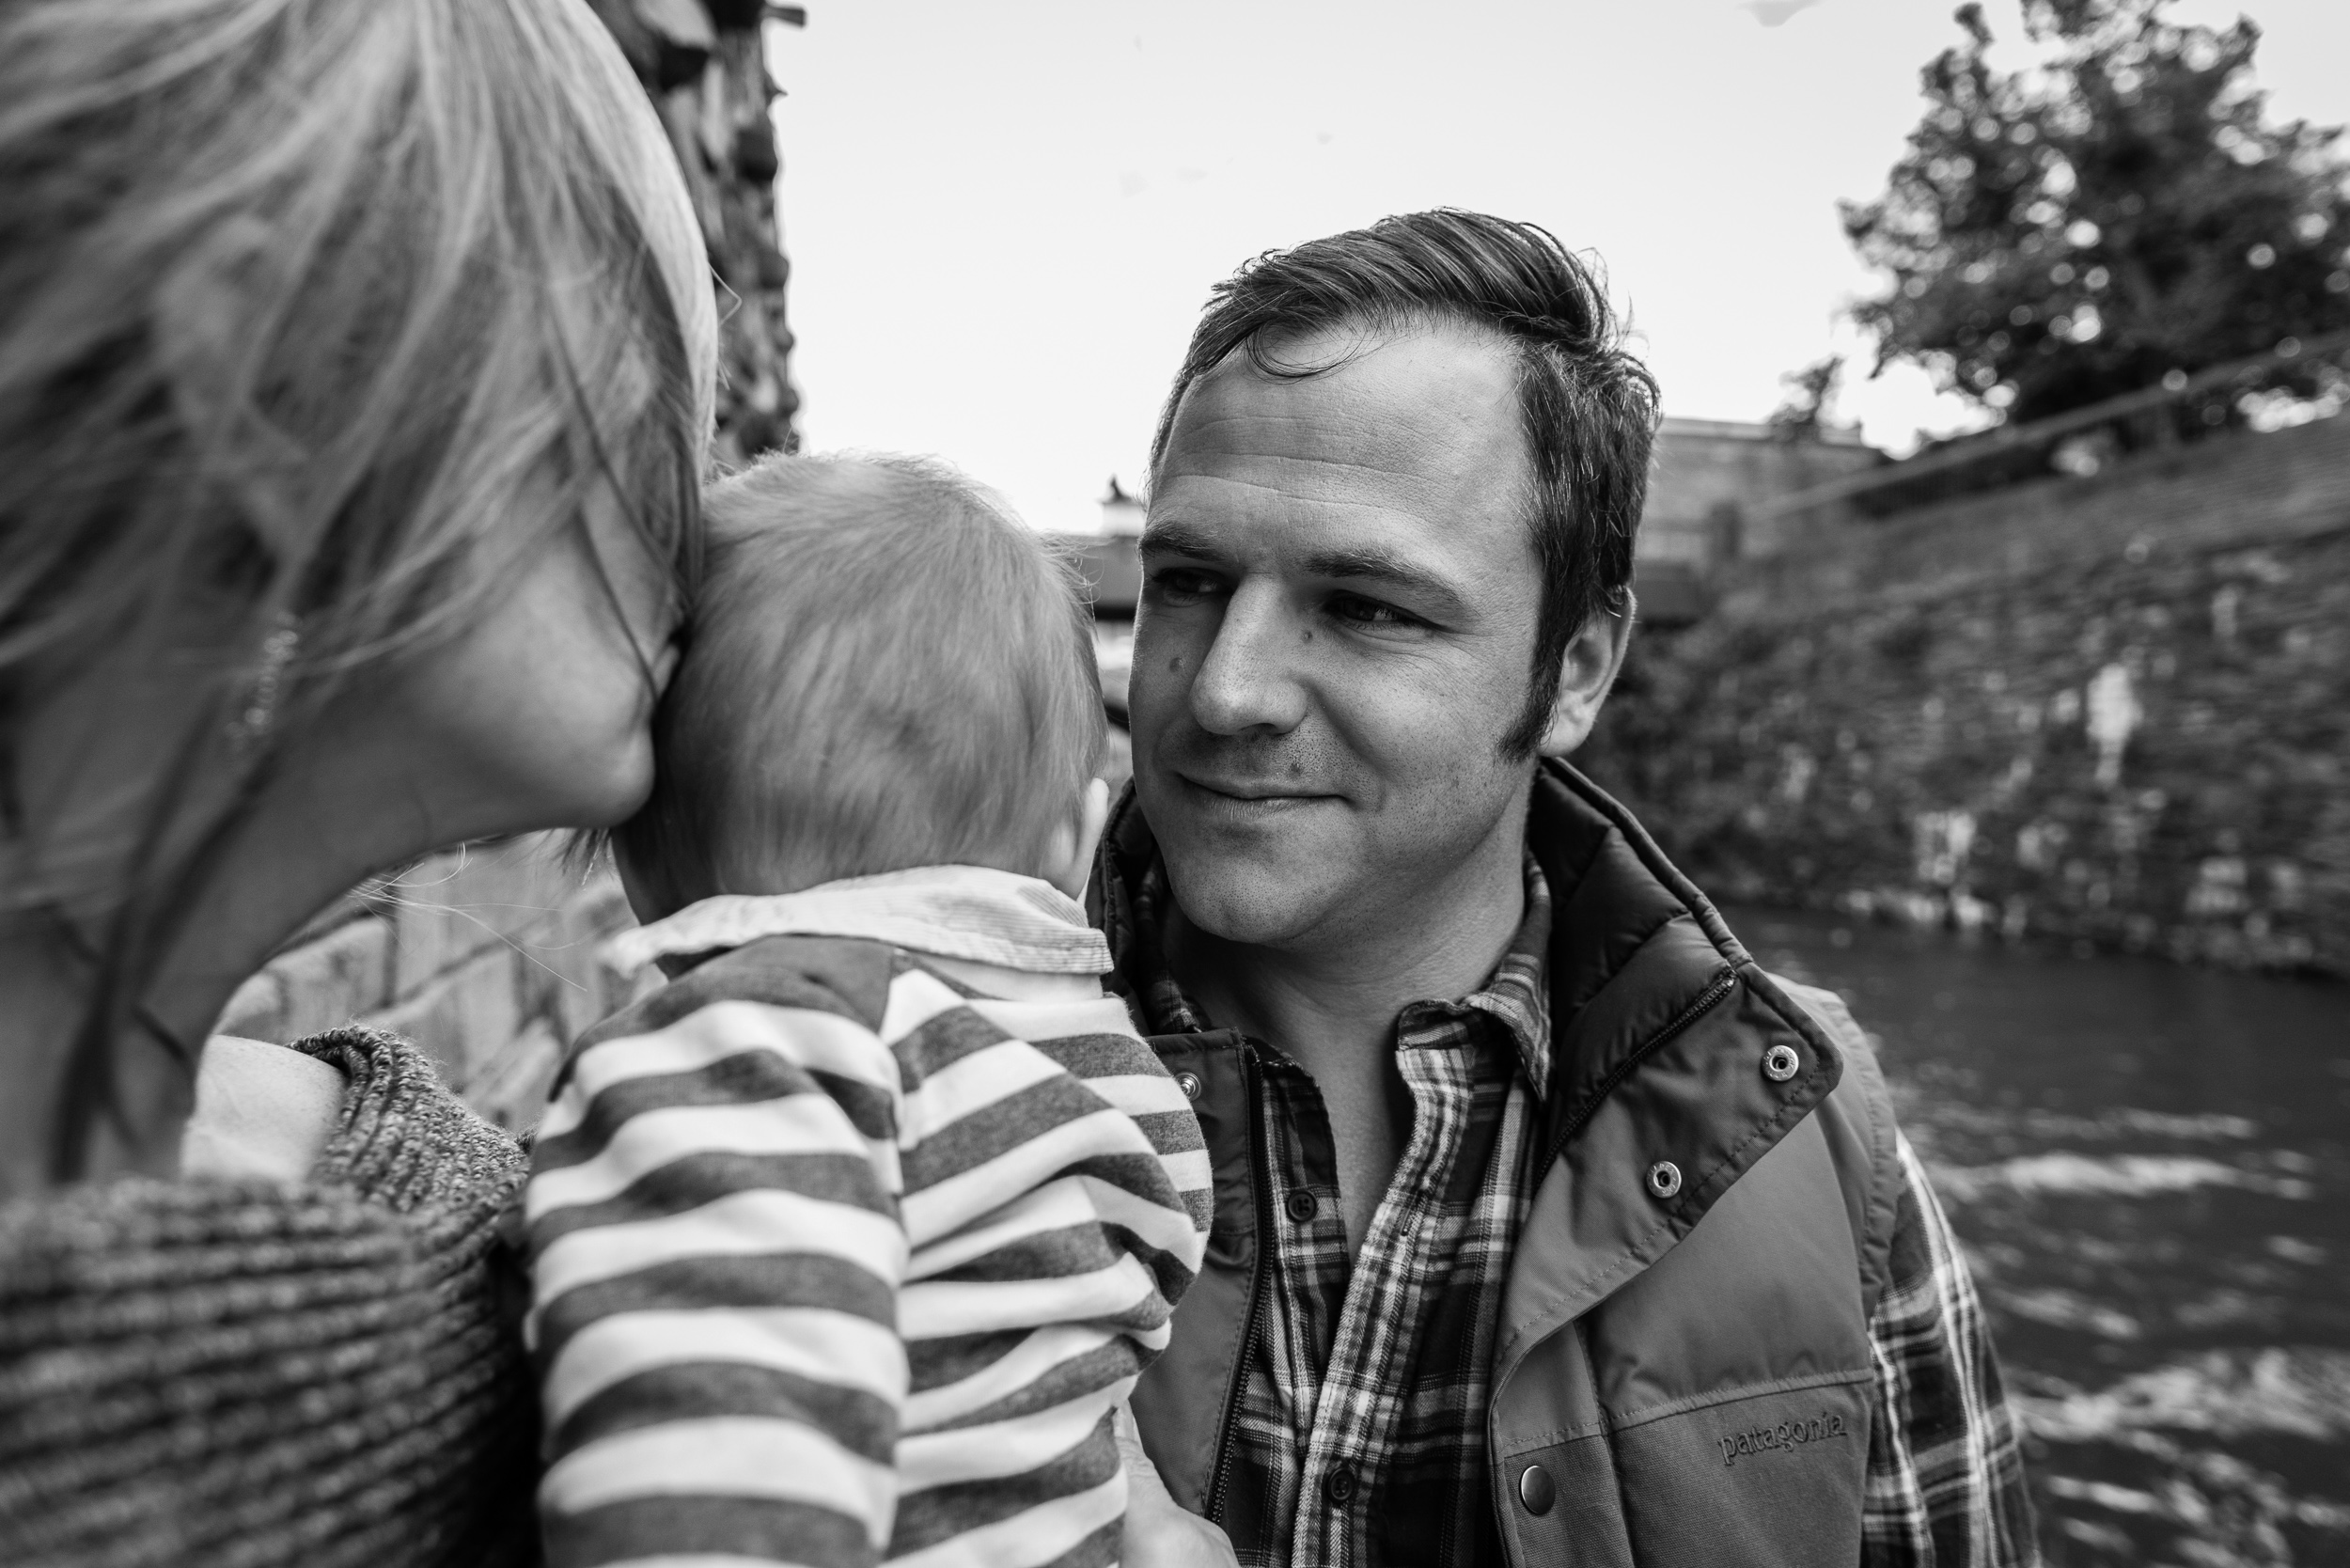 Northern-Virginia-Family-Photographer-Nicole-Sanchez-14.jpg